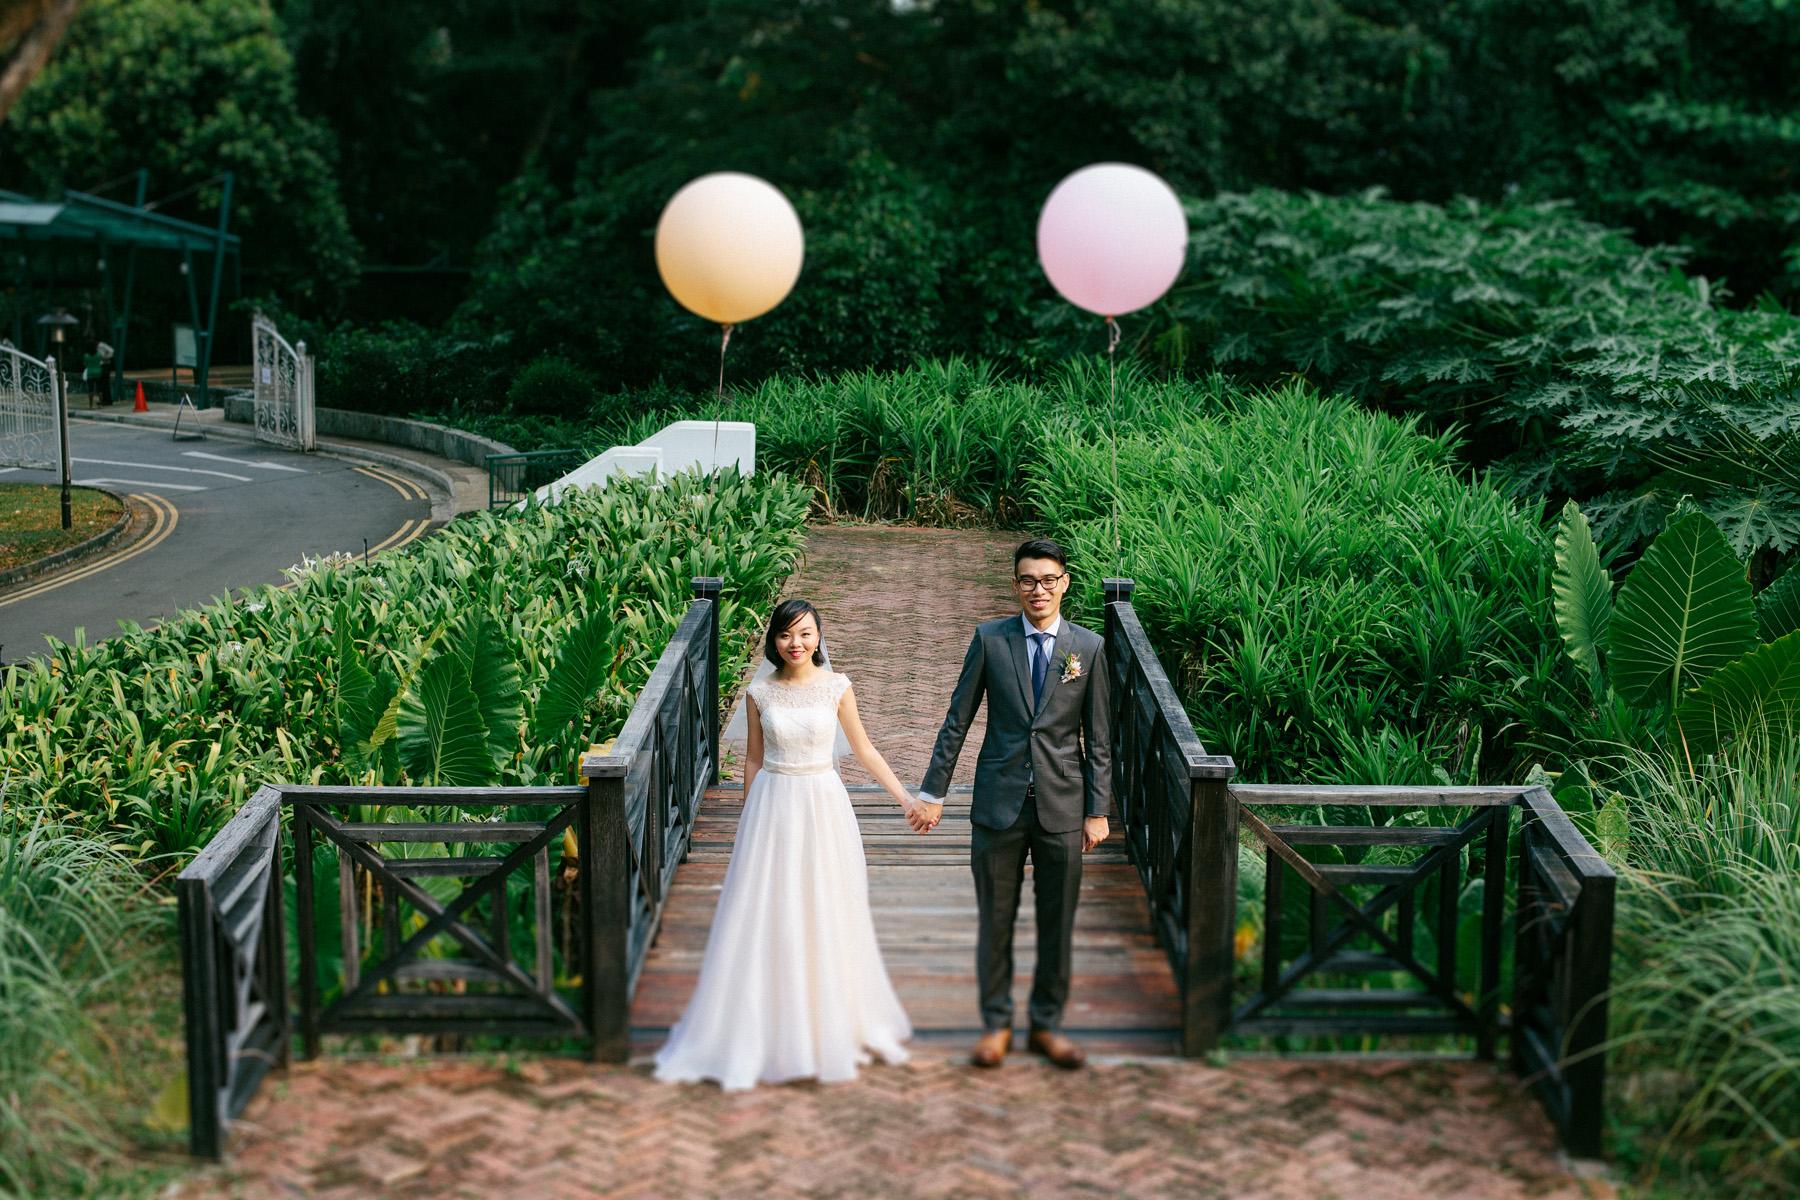 singapore-wedding-travel-photographer-faith-alvin-wedding-wmt-31.jpg